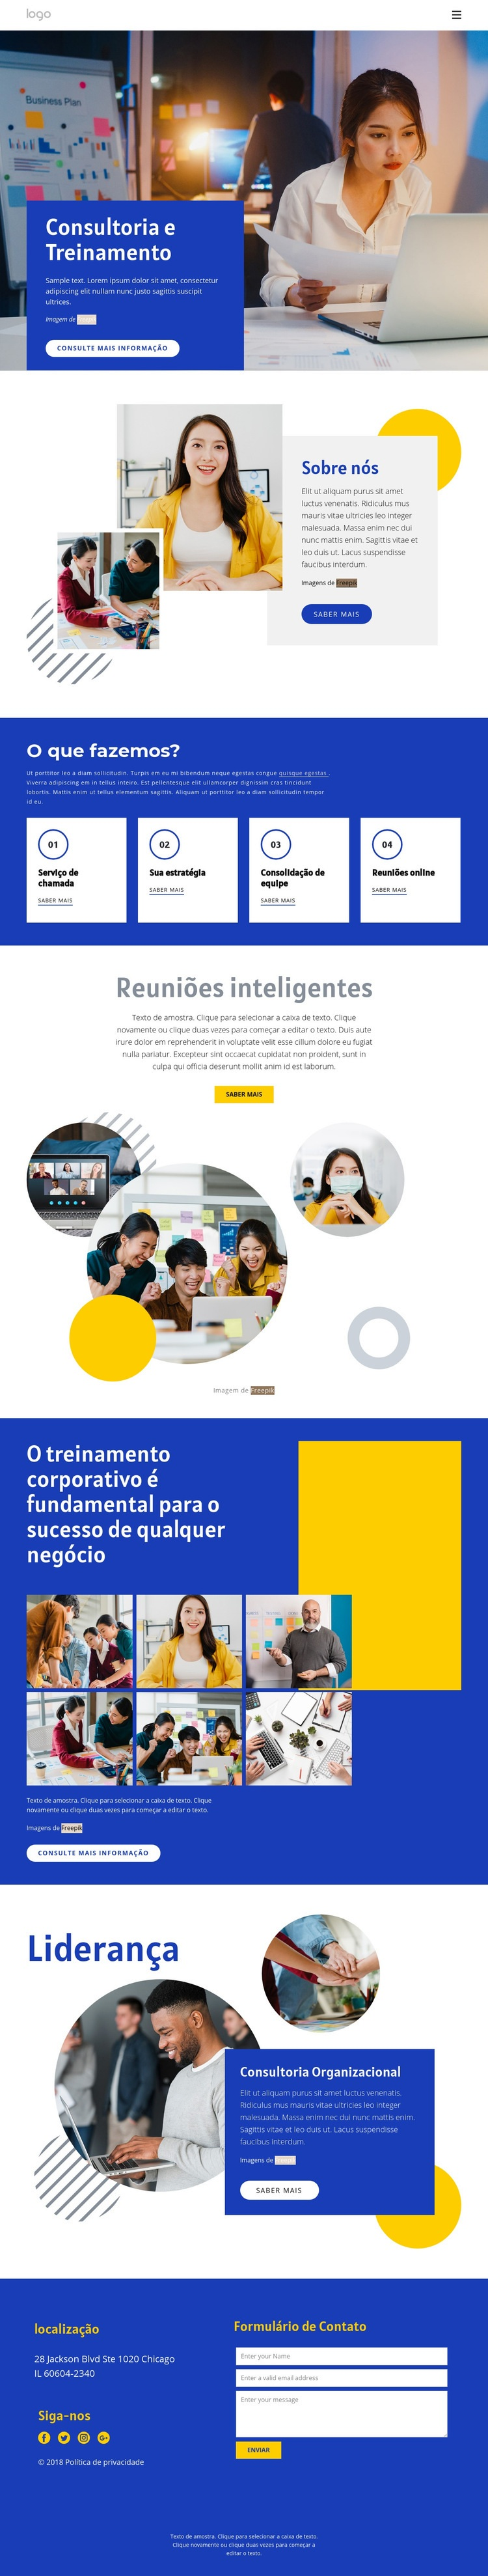 Consultoria e treinamento Modelo de site